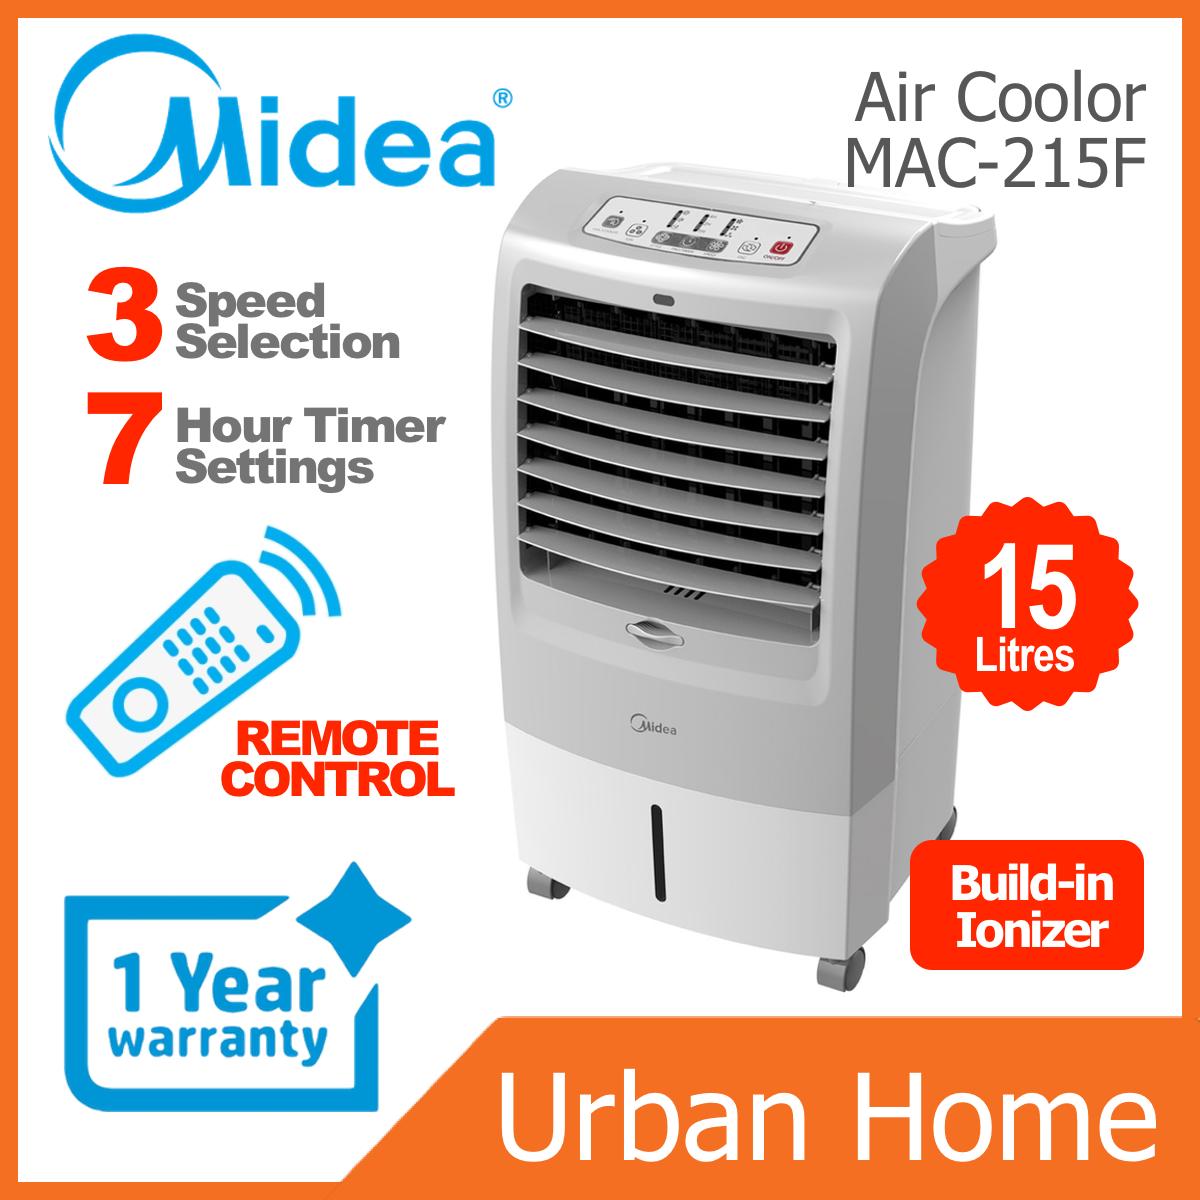 MIDEA 15L Remote Control Ionizer Air Cooler (MAC-215F/MAC215F)